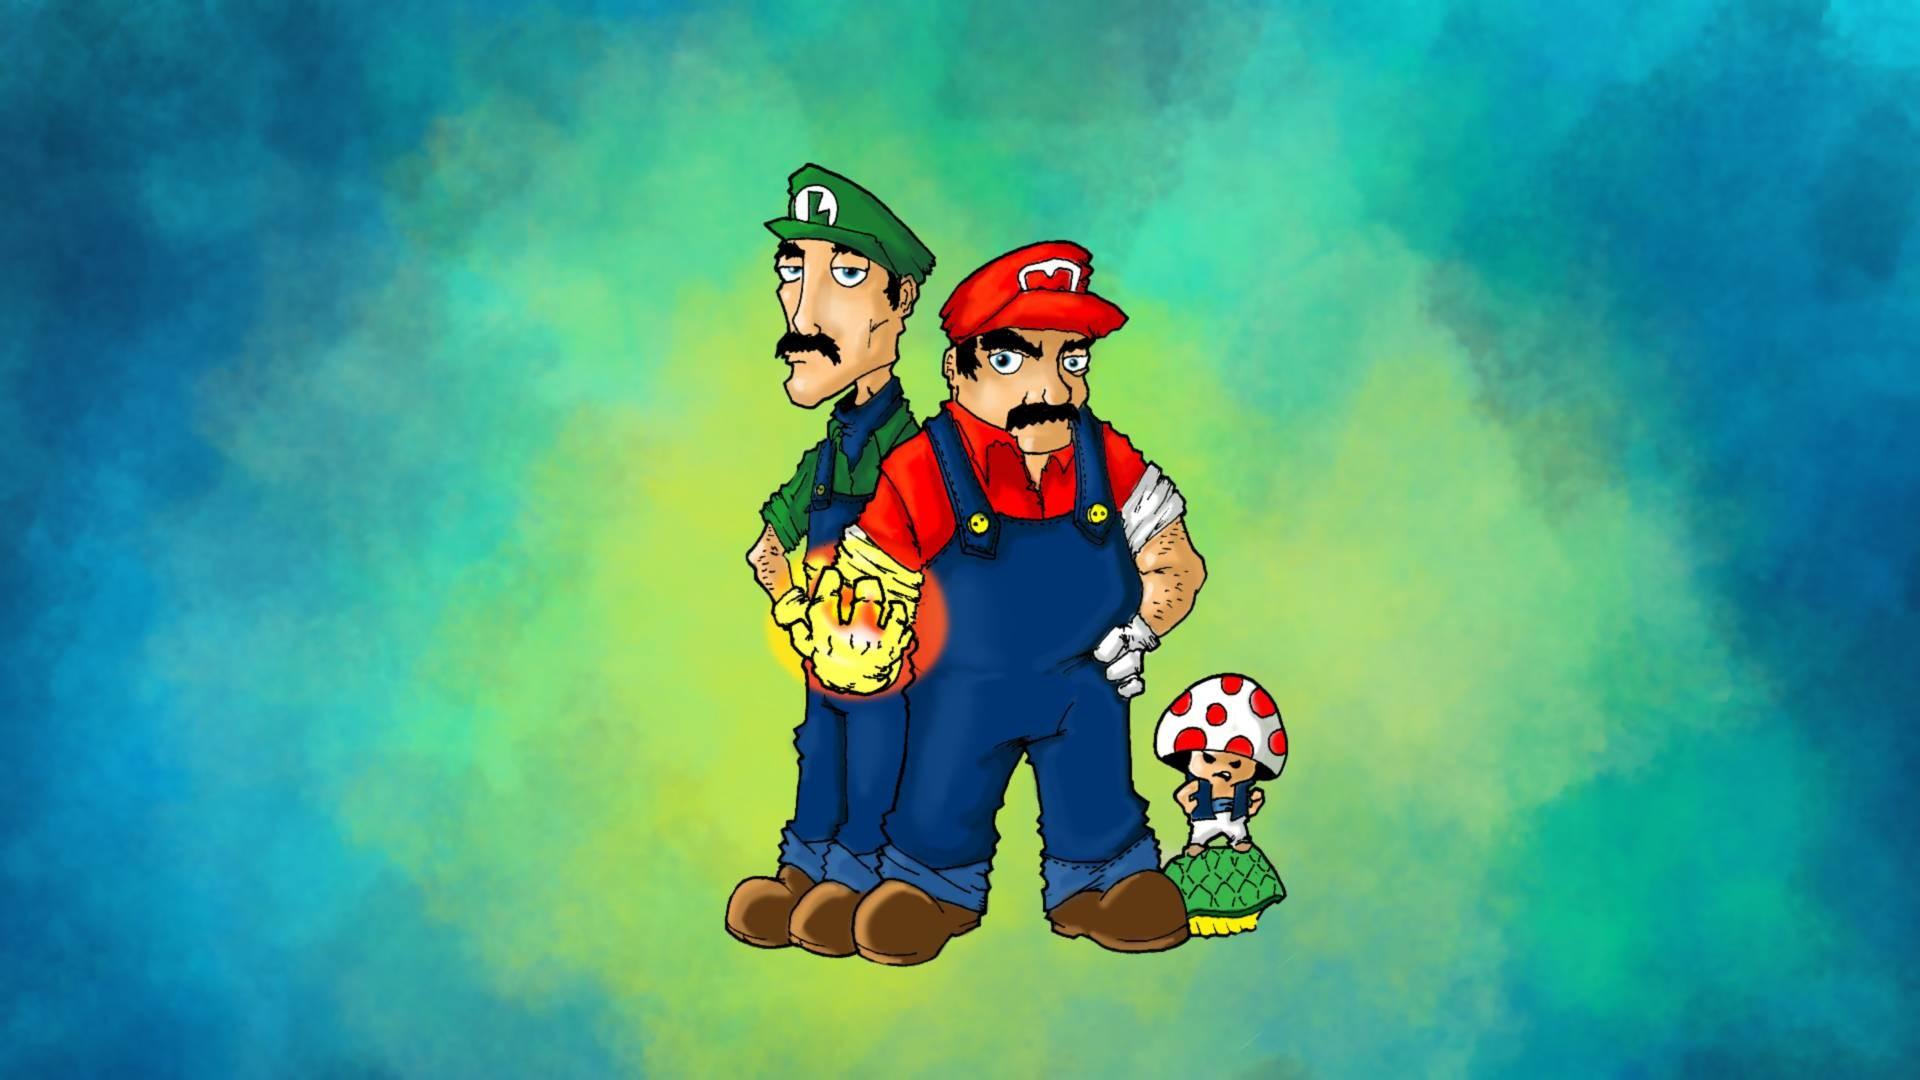 Luigi and Mario – Super Mario Wallpaper